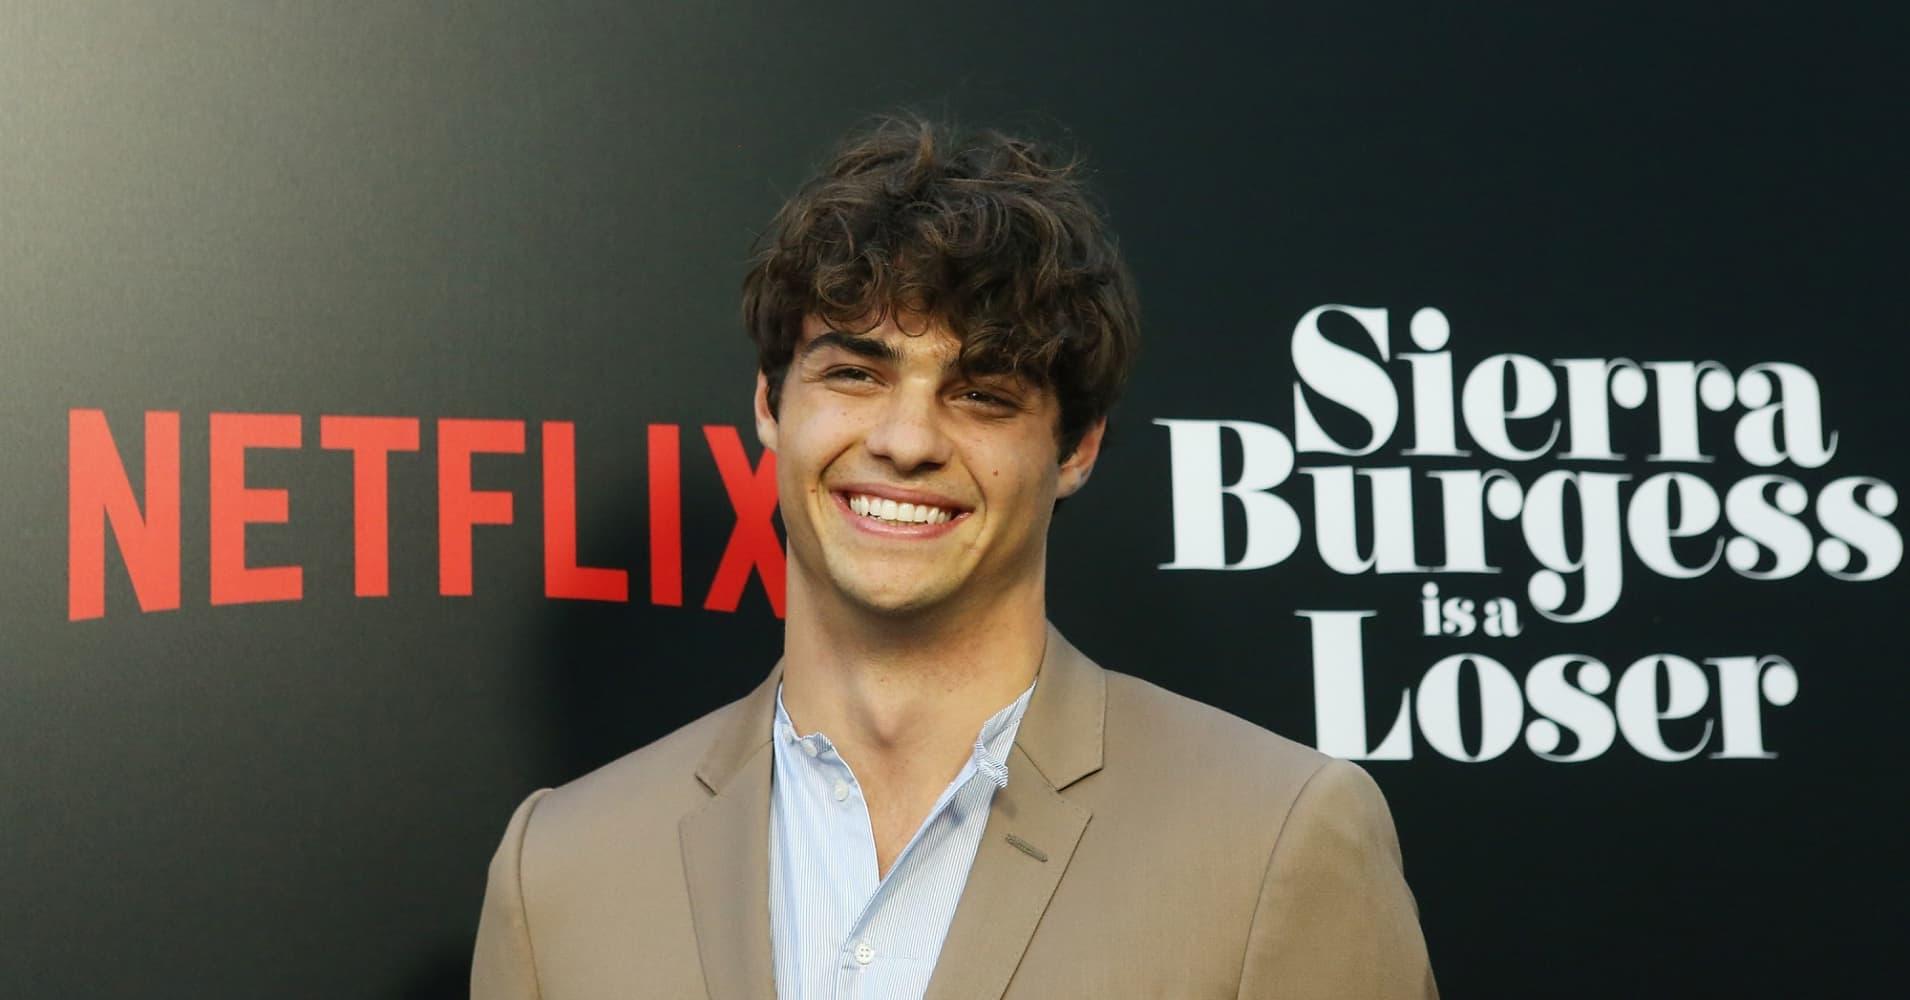 Actor Noah Centineo